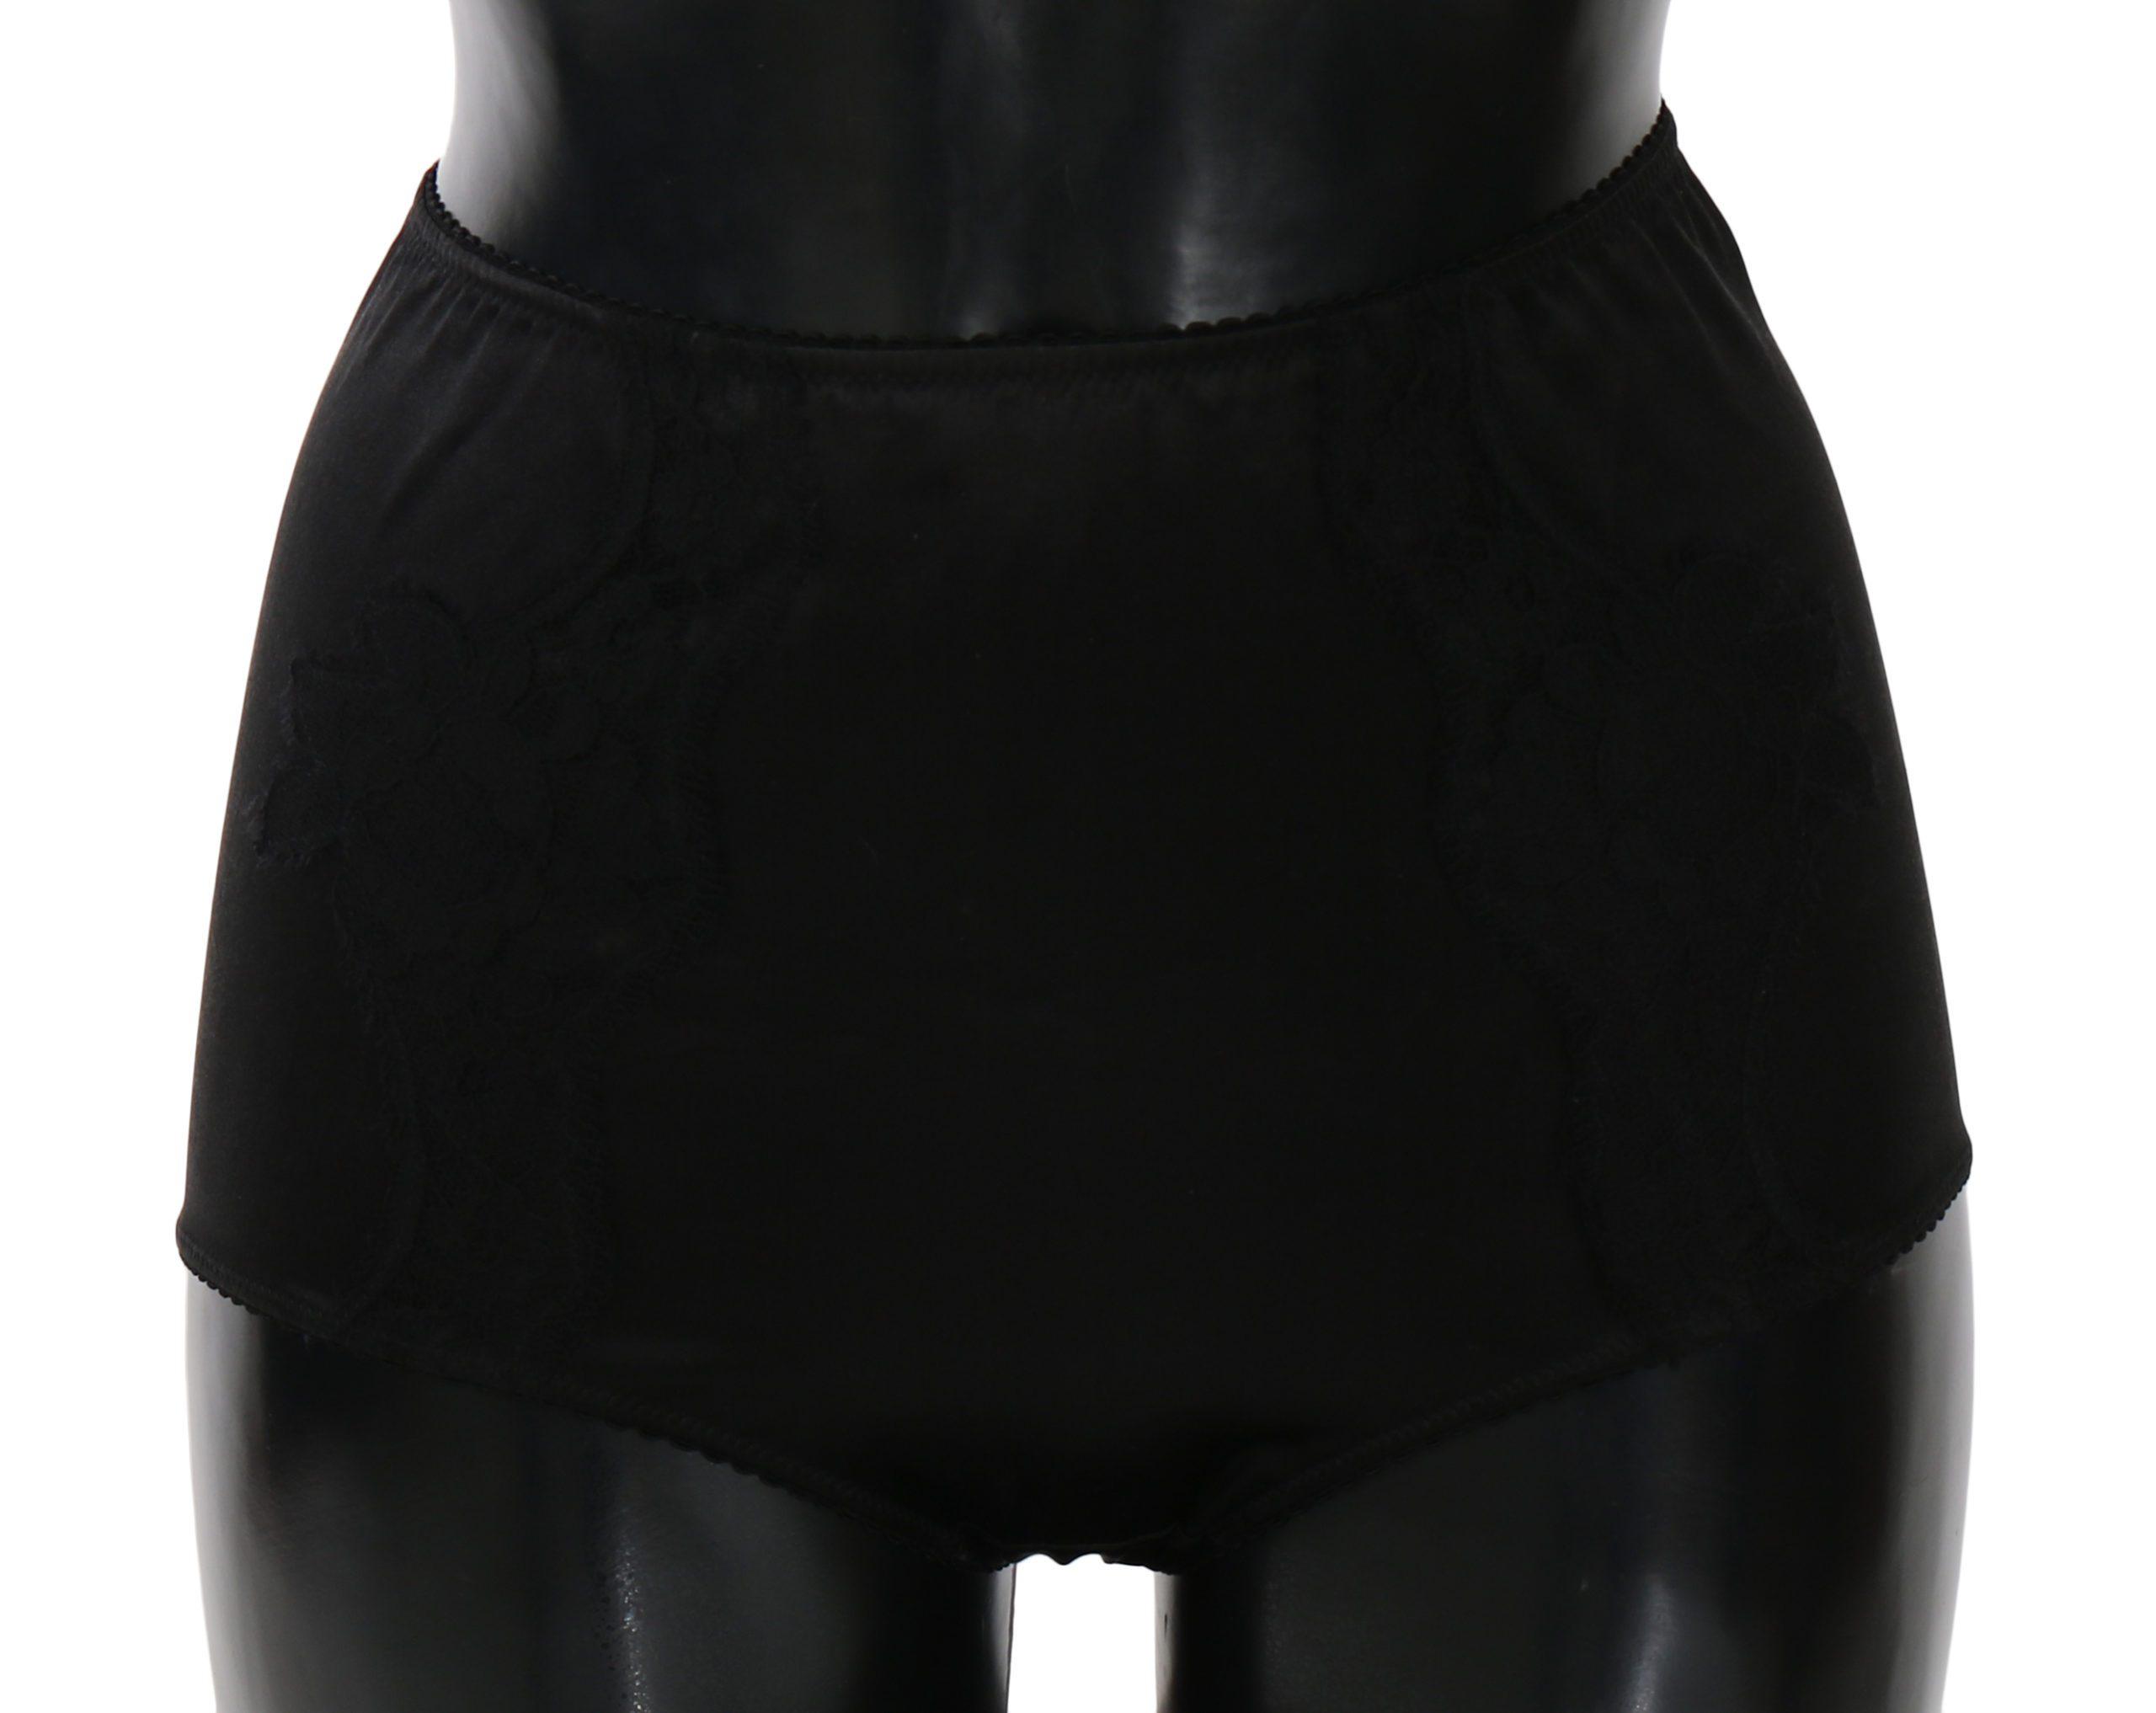 Dolce & Gabbana Women's Silk Lace Stretch Underwear Black BIK672 - IT1 | XS